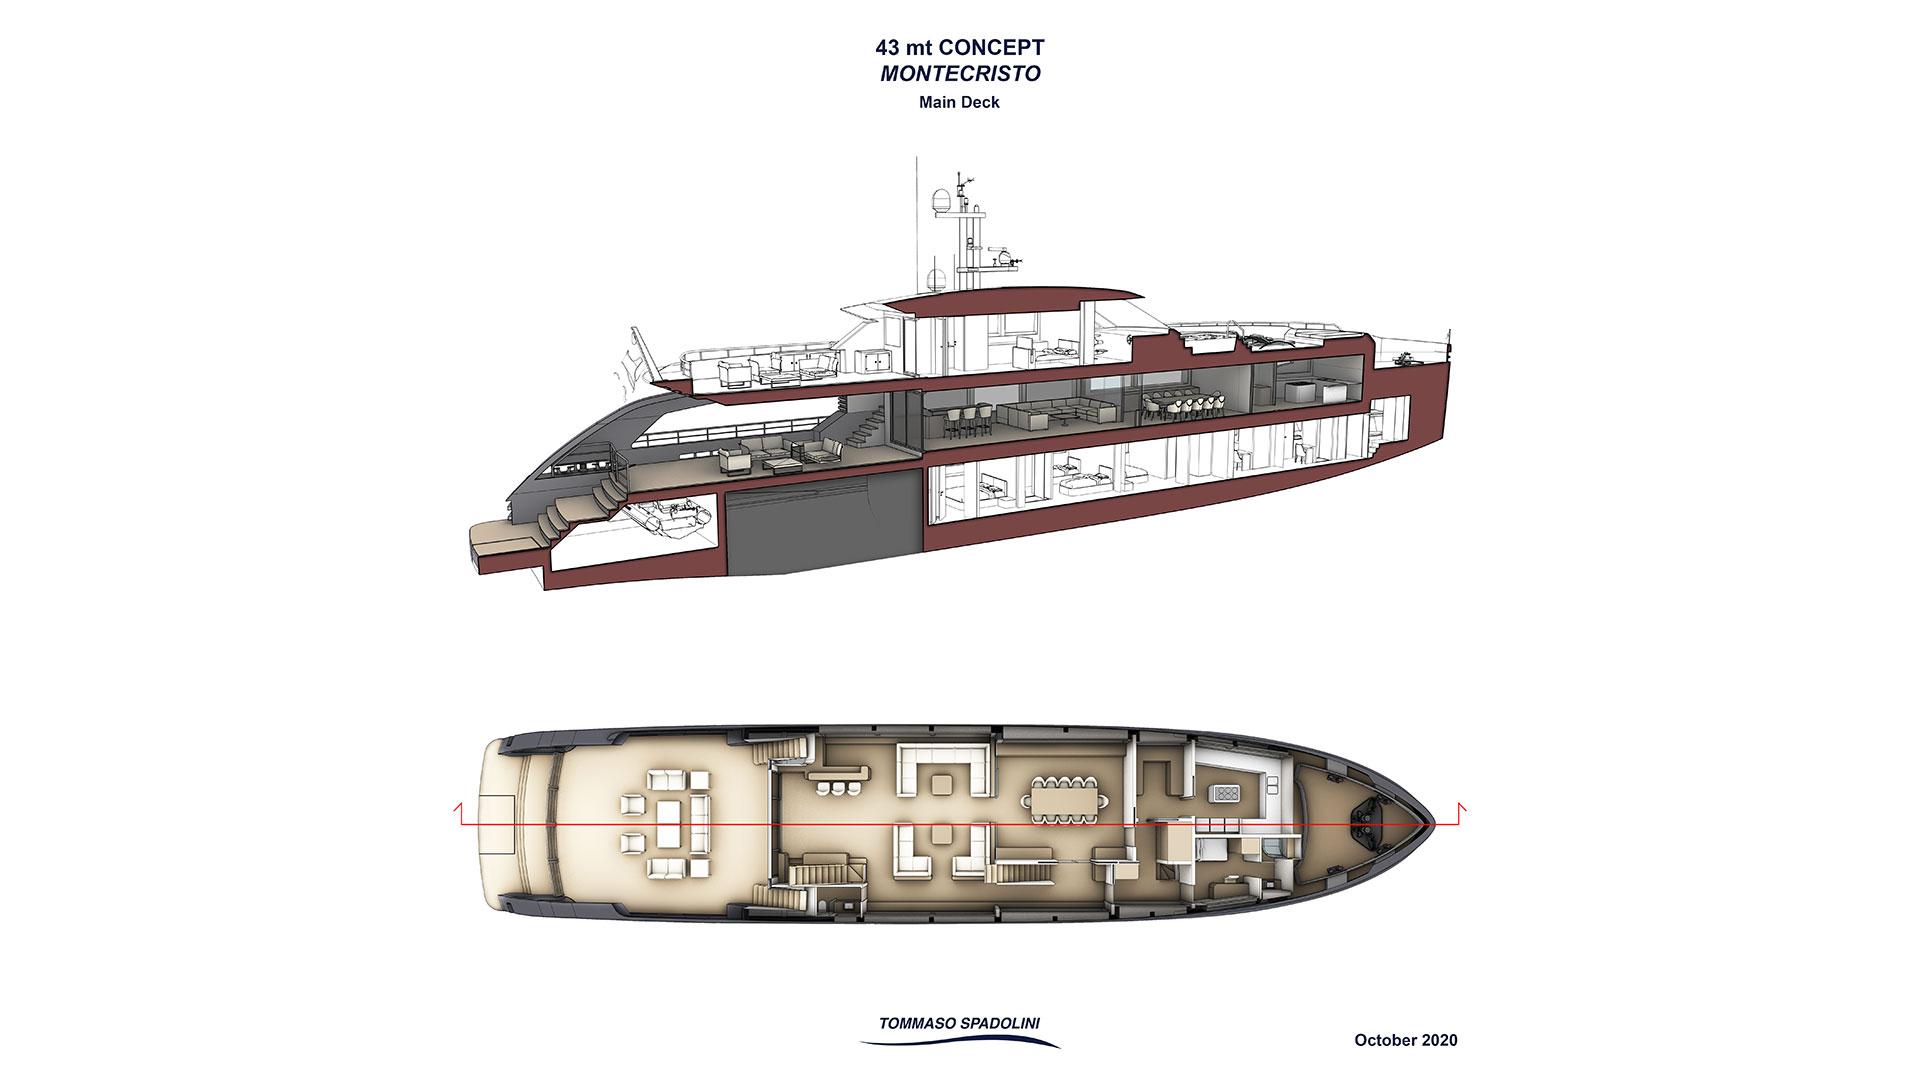 montecristo-43